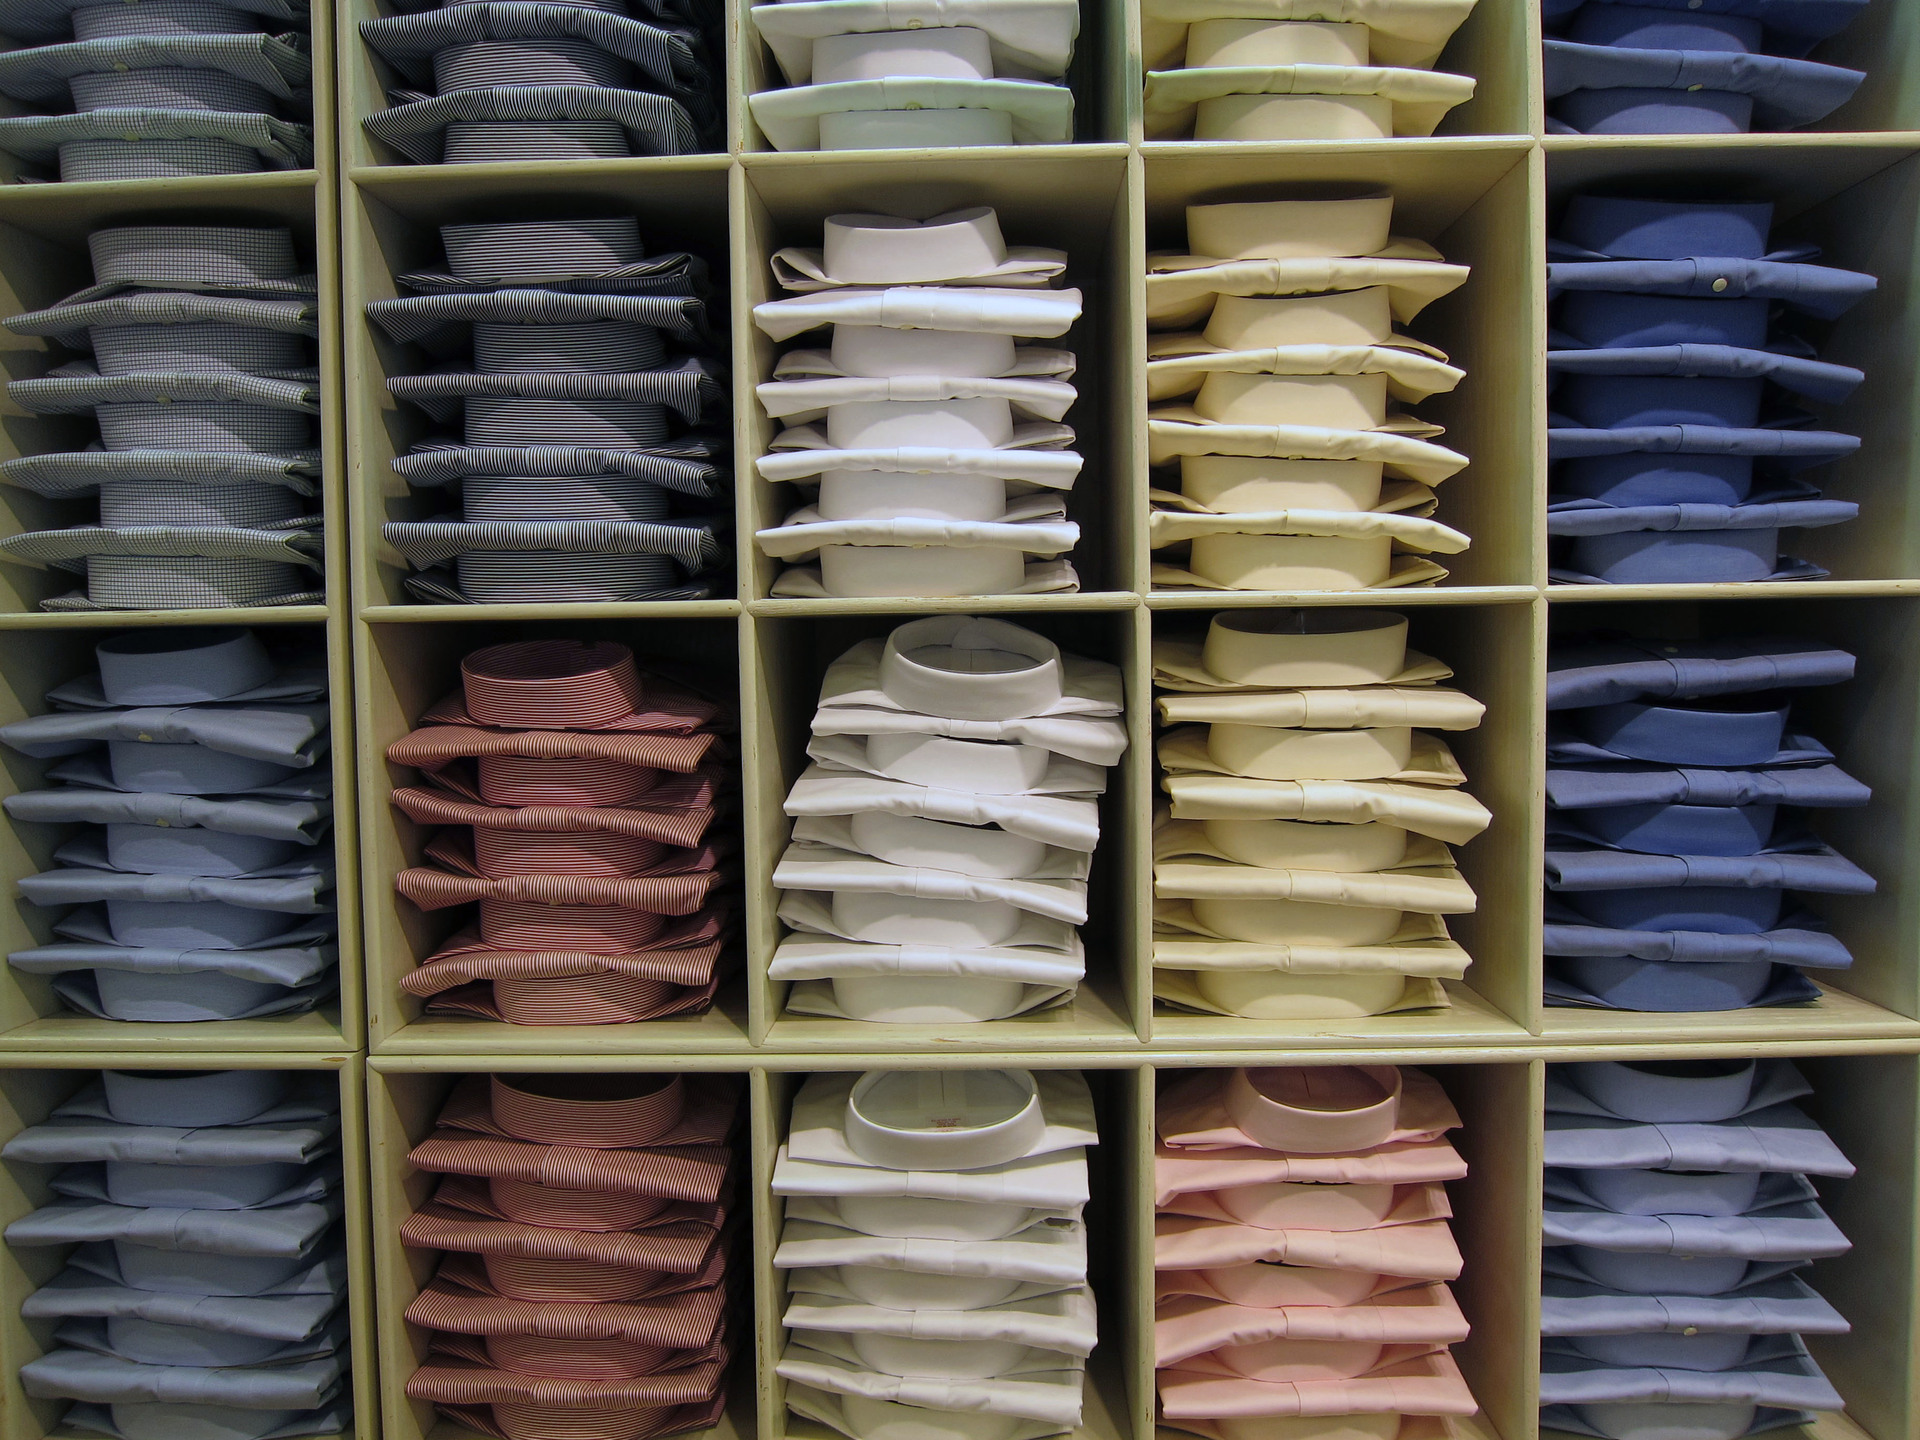 shirts-1412458-1920x1440